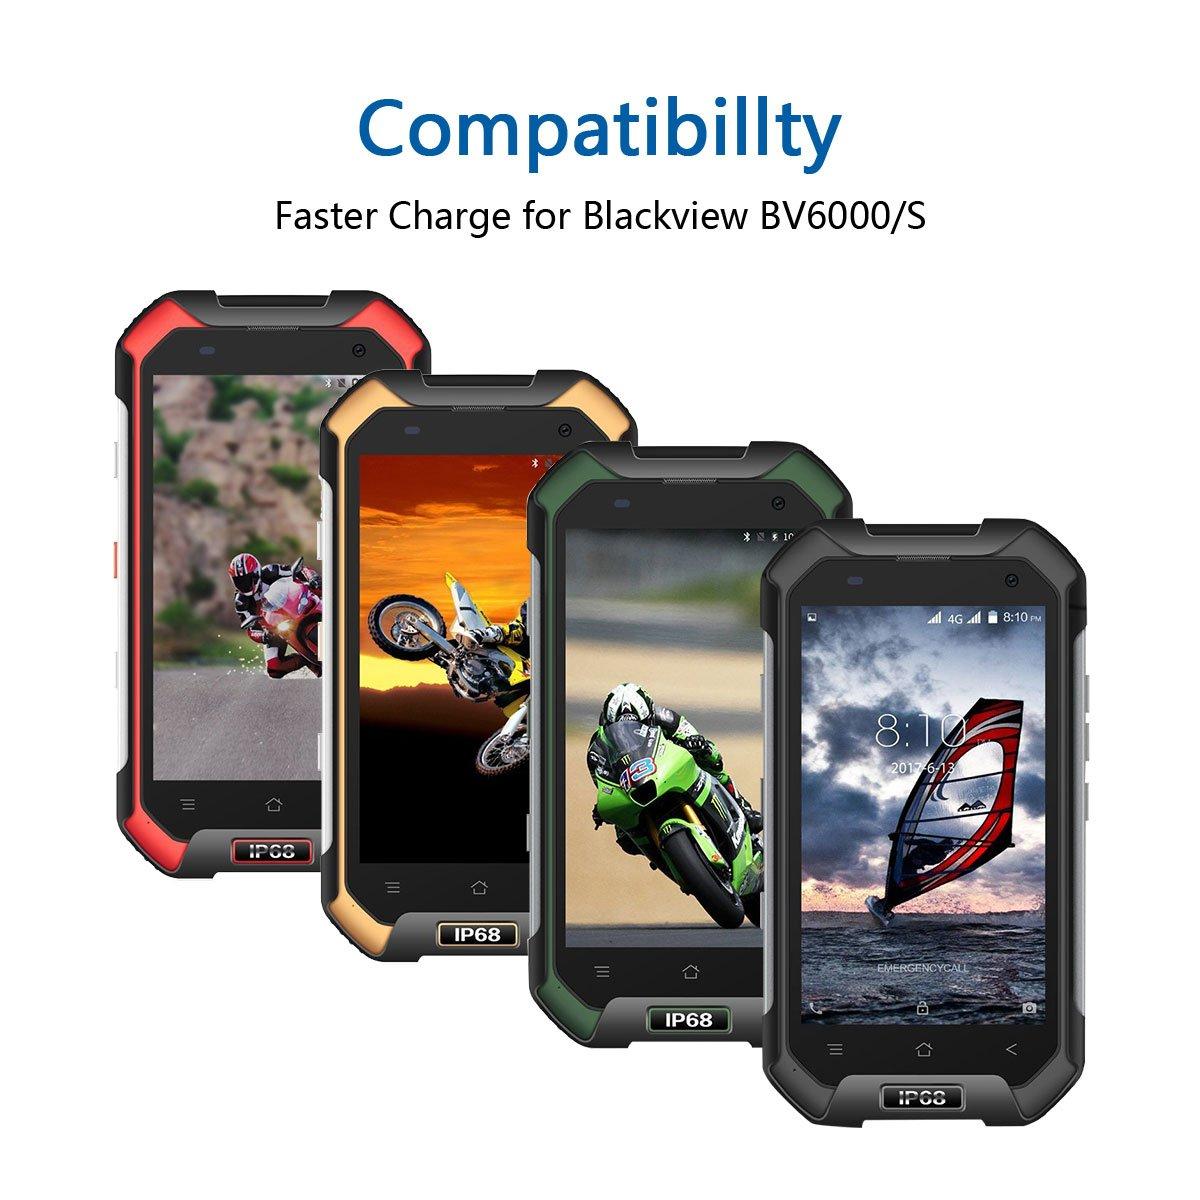 1m Micro USB Cable de Carga para Blackview BV6000 / BV6000S Móvil Resistente - Trenzado de Nylon Sincro Cable 2.4A Alta Velocidad Carga Rápida